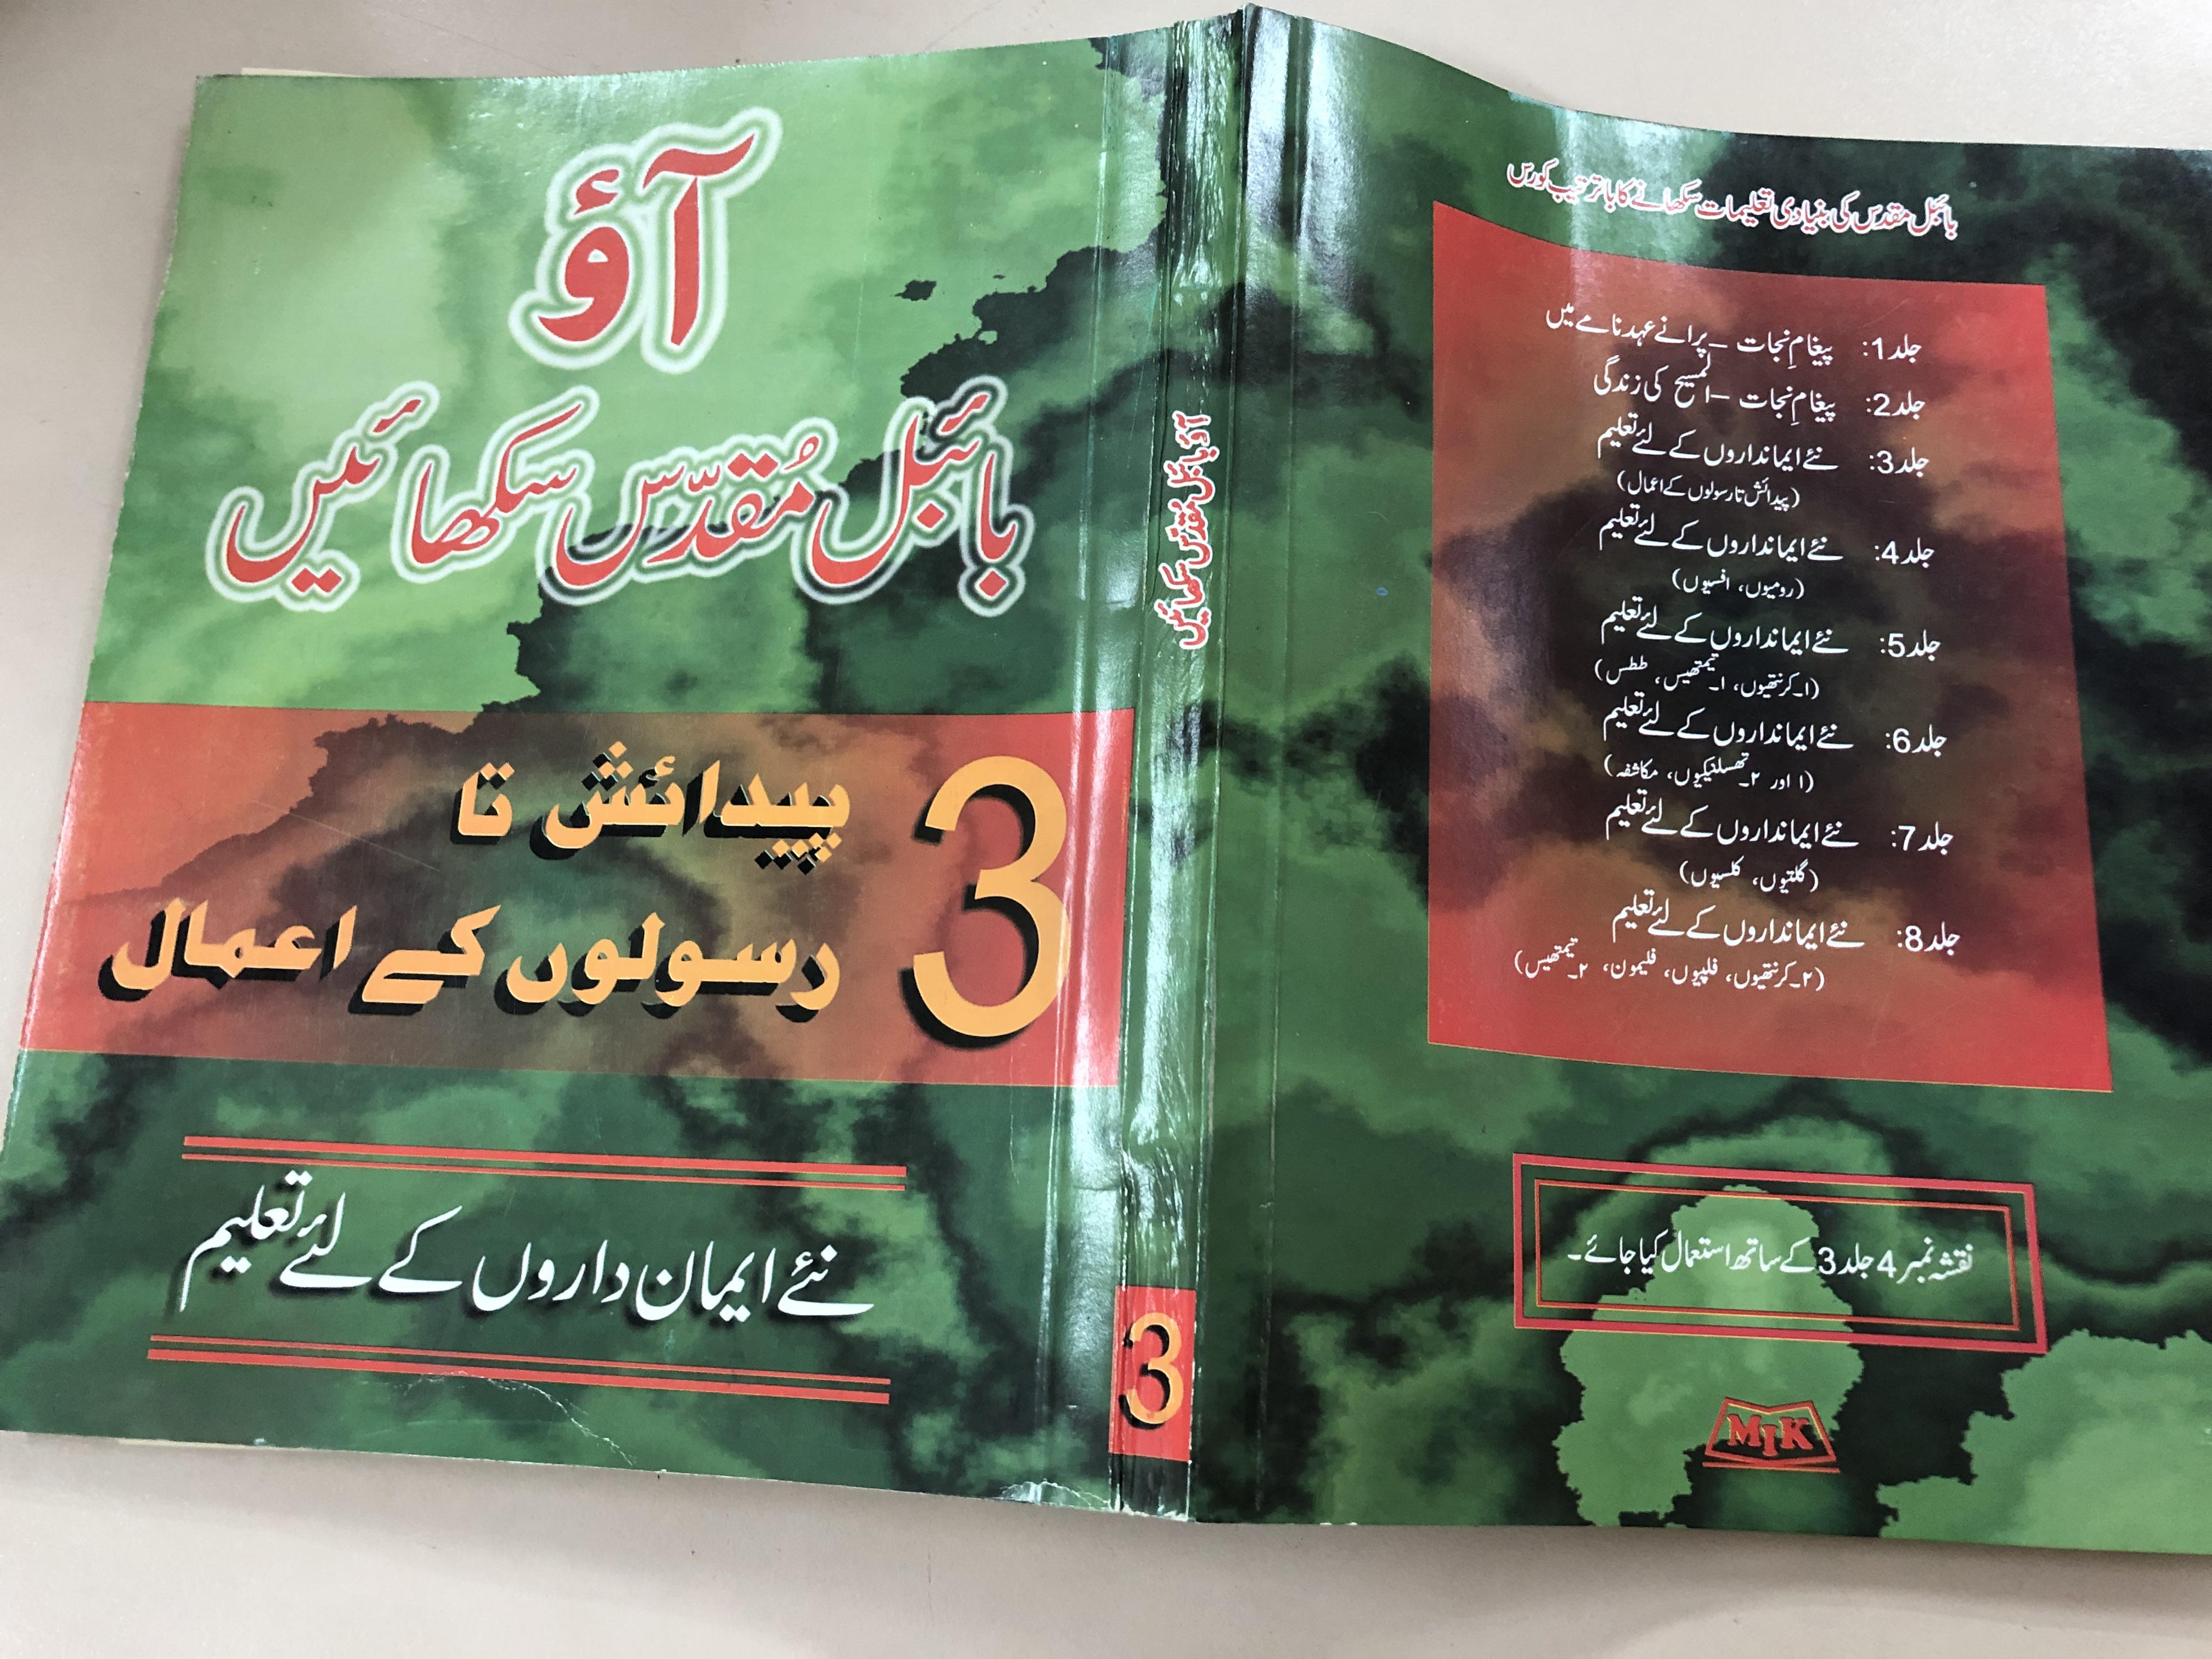 building-on-firm-foundations-vol.3-by-trevor-mcilwain-urdu-edition-evangelism-the-old-testament-pakistan-2007-13-.jpg